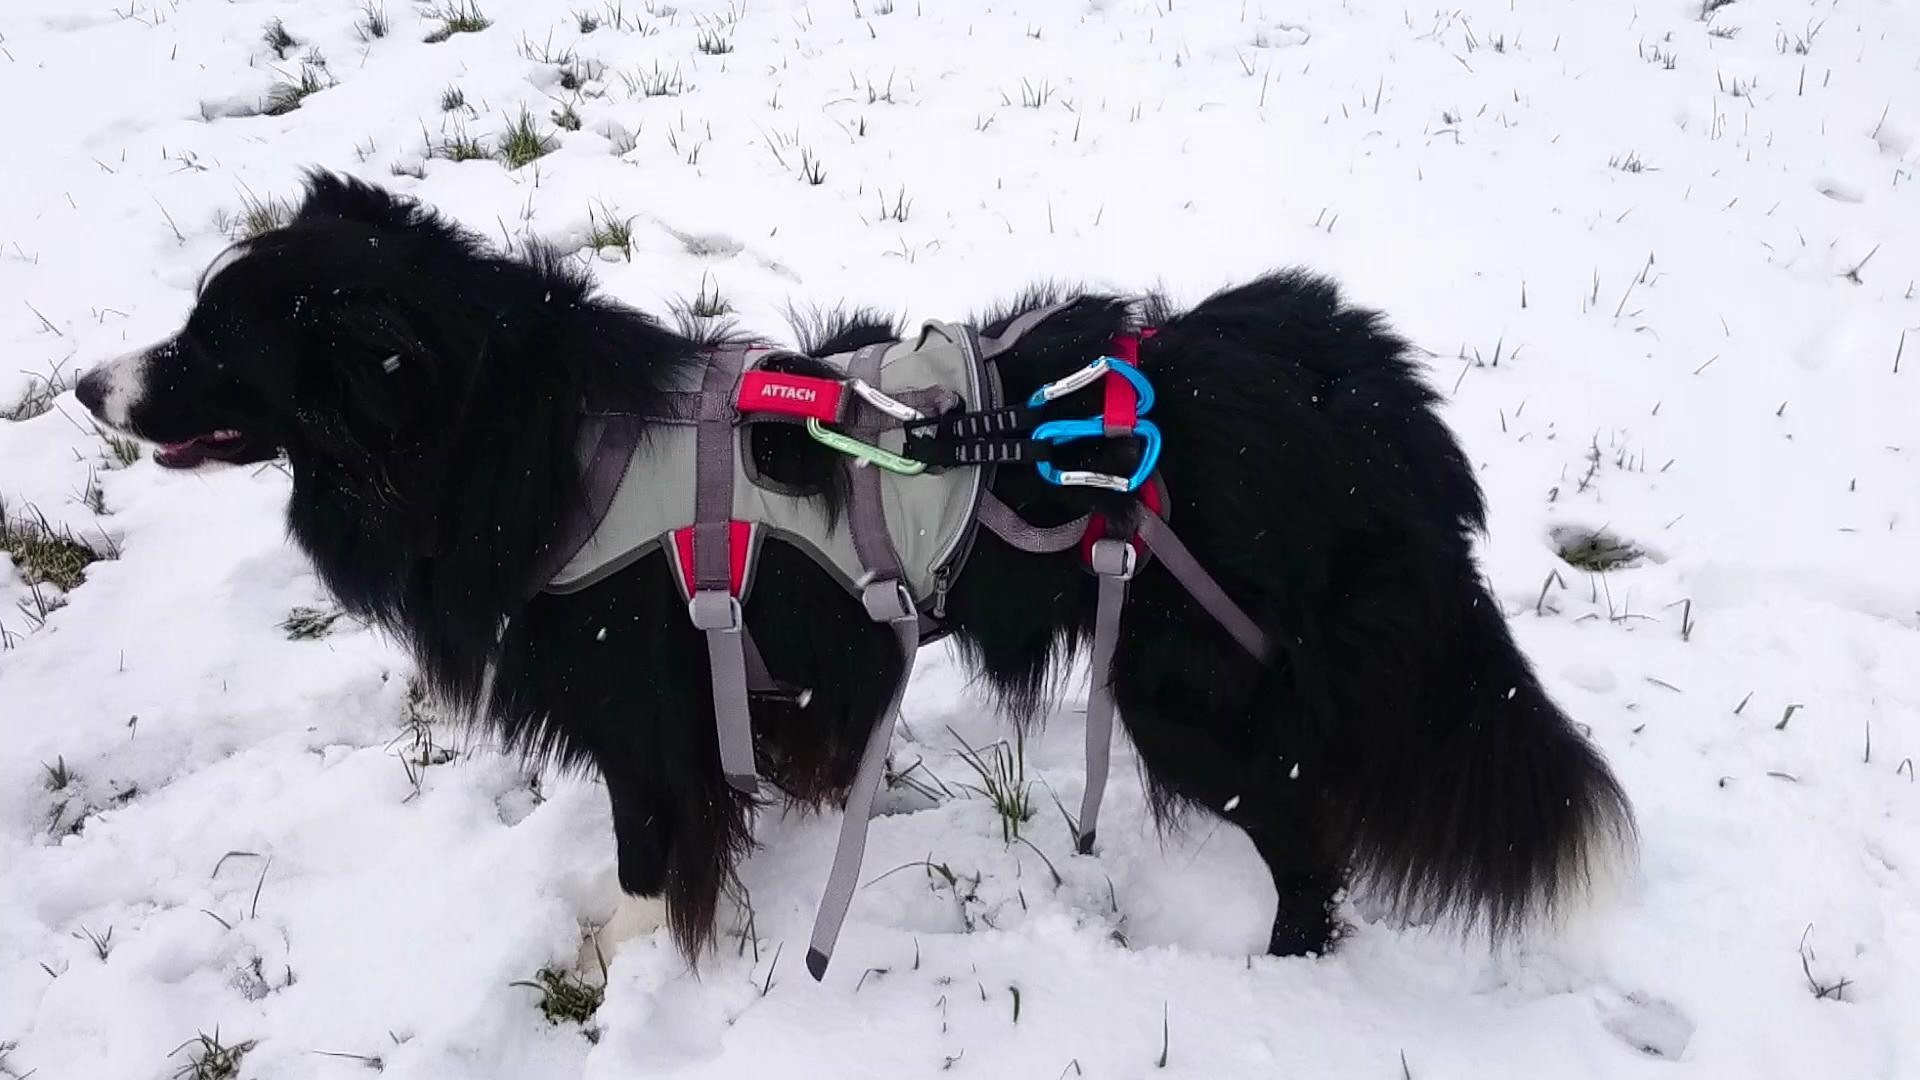 Klettergurt Hund : Double back harness hunde abseil klettergeschirr outsidestories